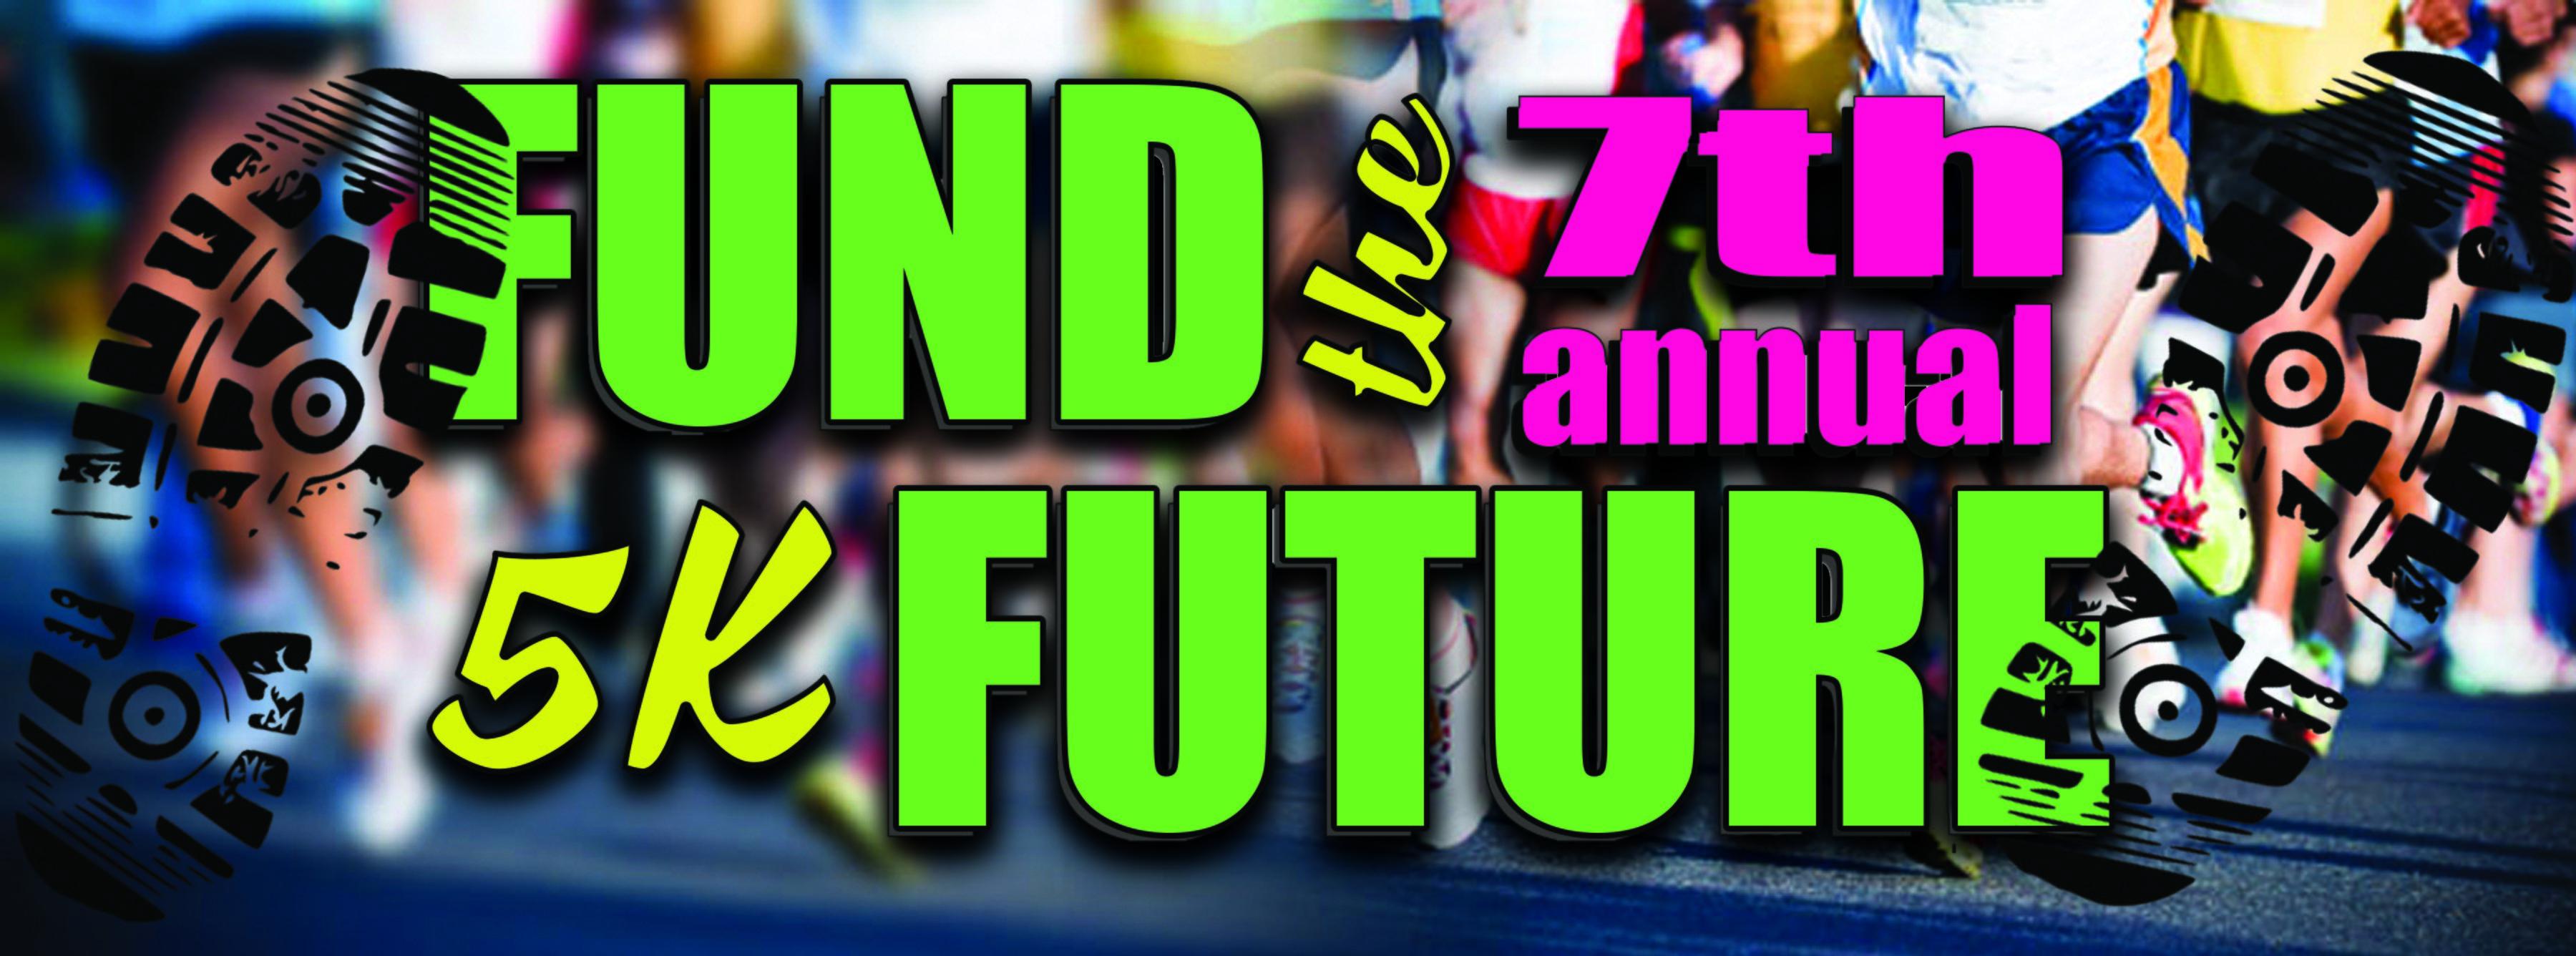 The 7th annual 5K Fund the Future